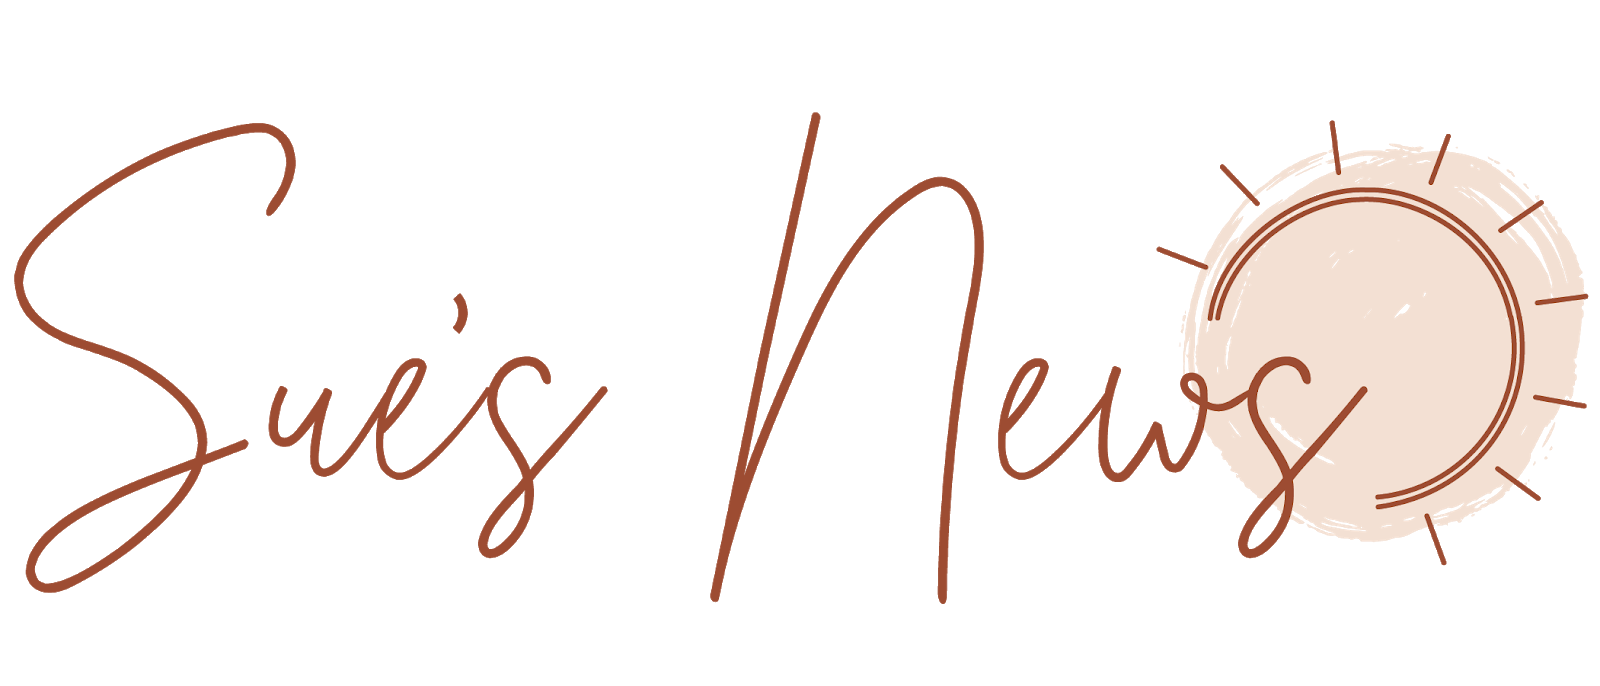 Sue's News